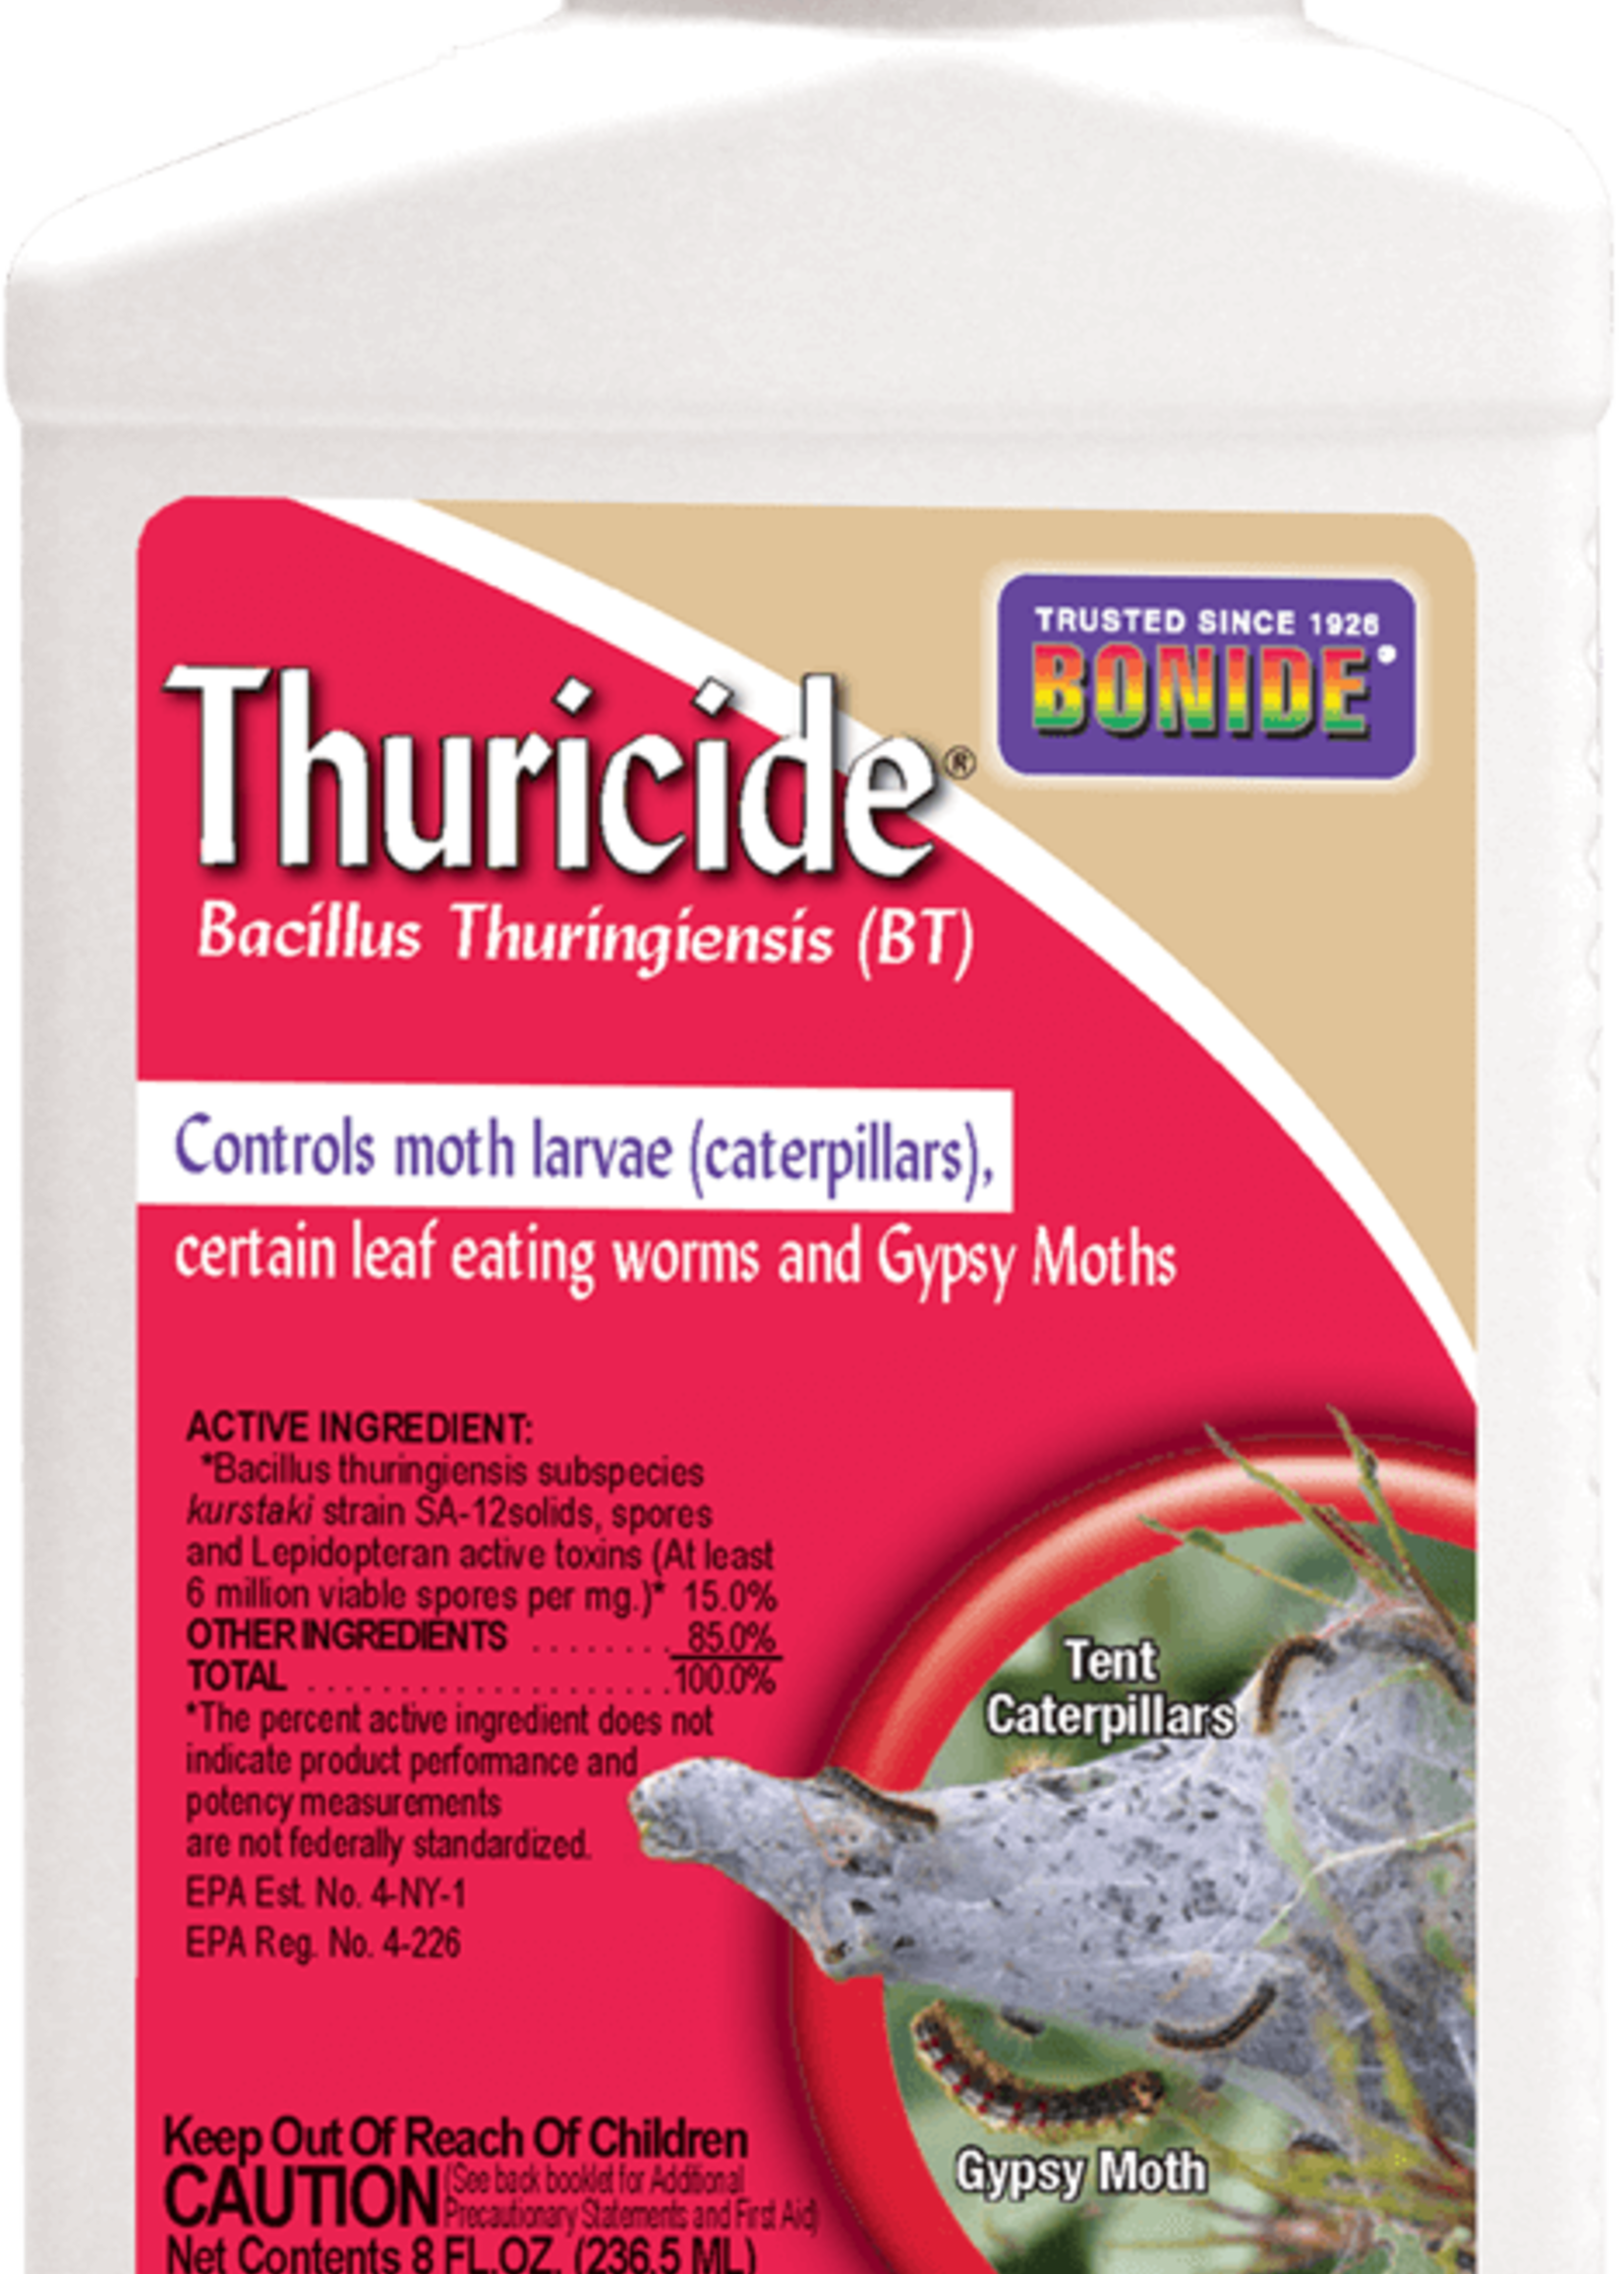 Bonide Thuricide (BT) 15% concentrate 16 oz.